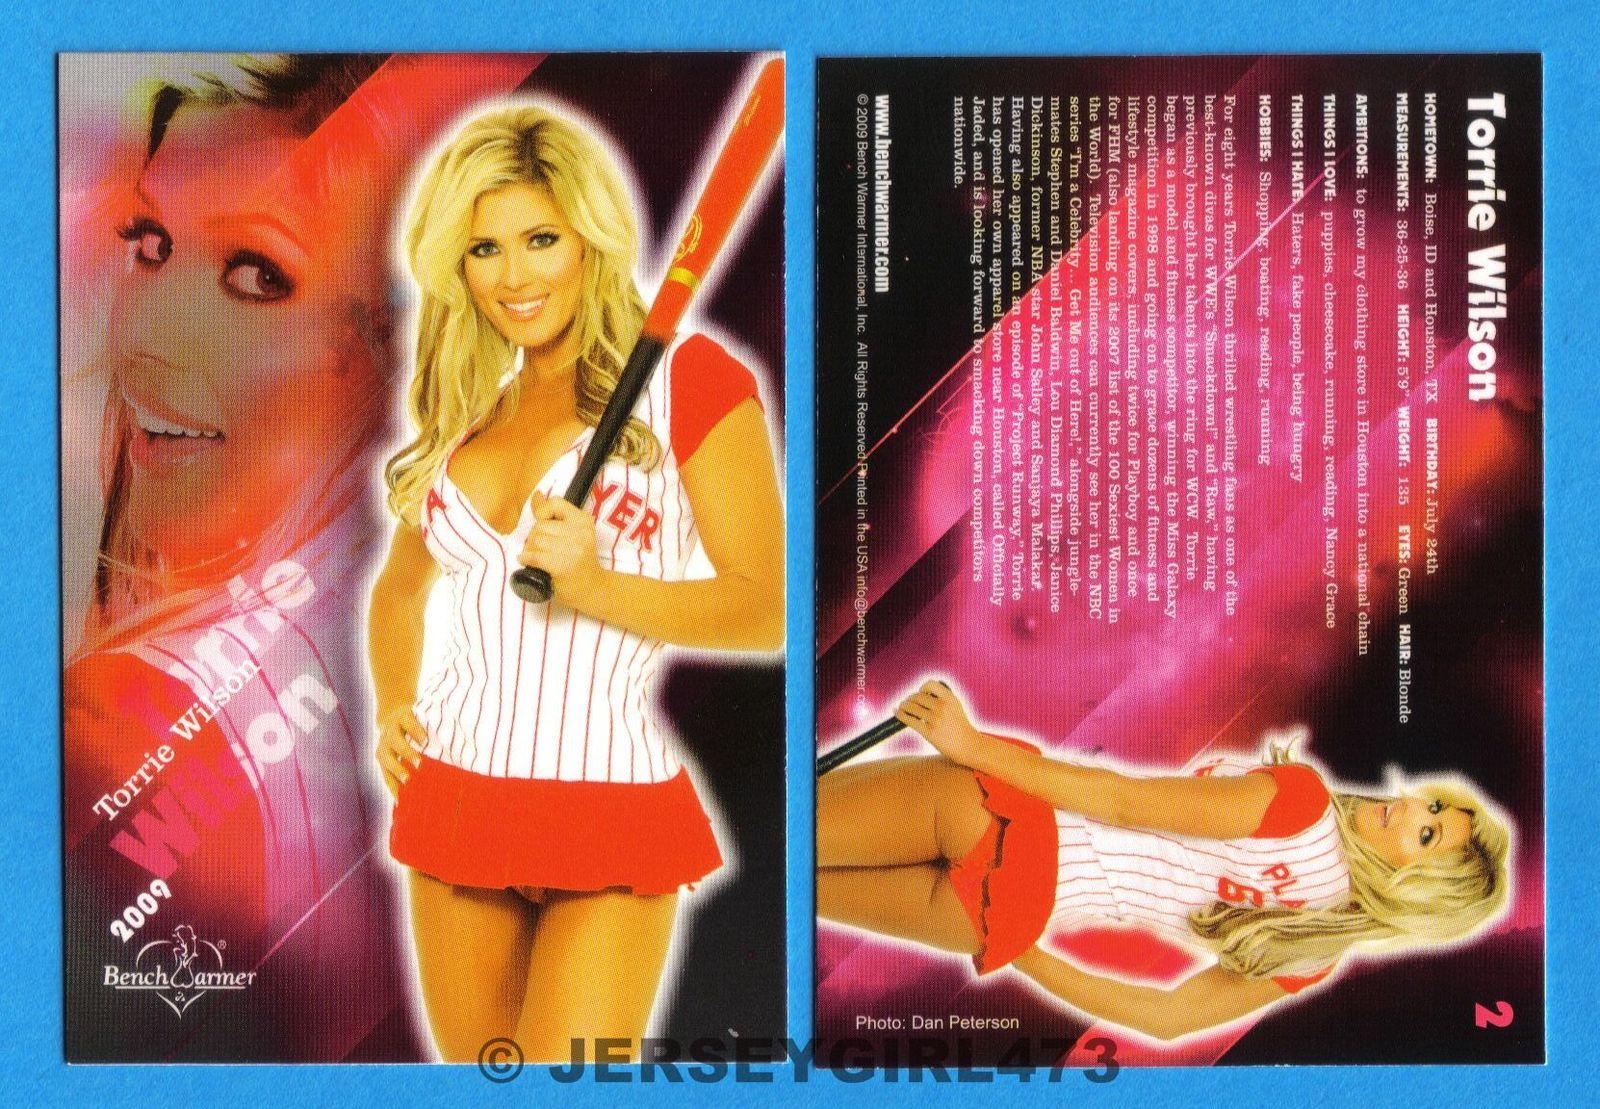 Torrie Wilson 2009 Bench Warmer Limited Series Card #2 ~ WWE DIVA